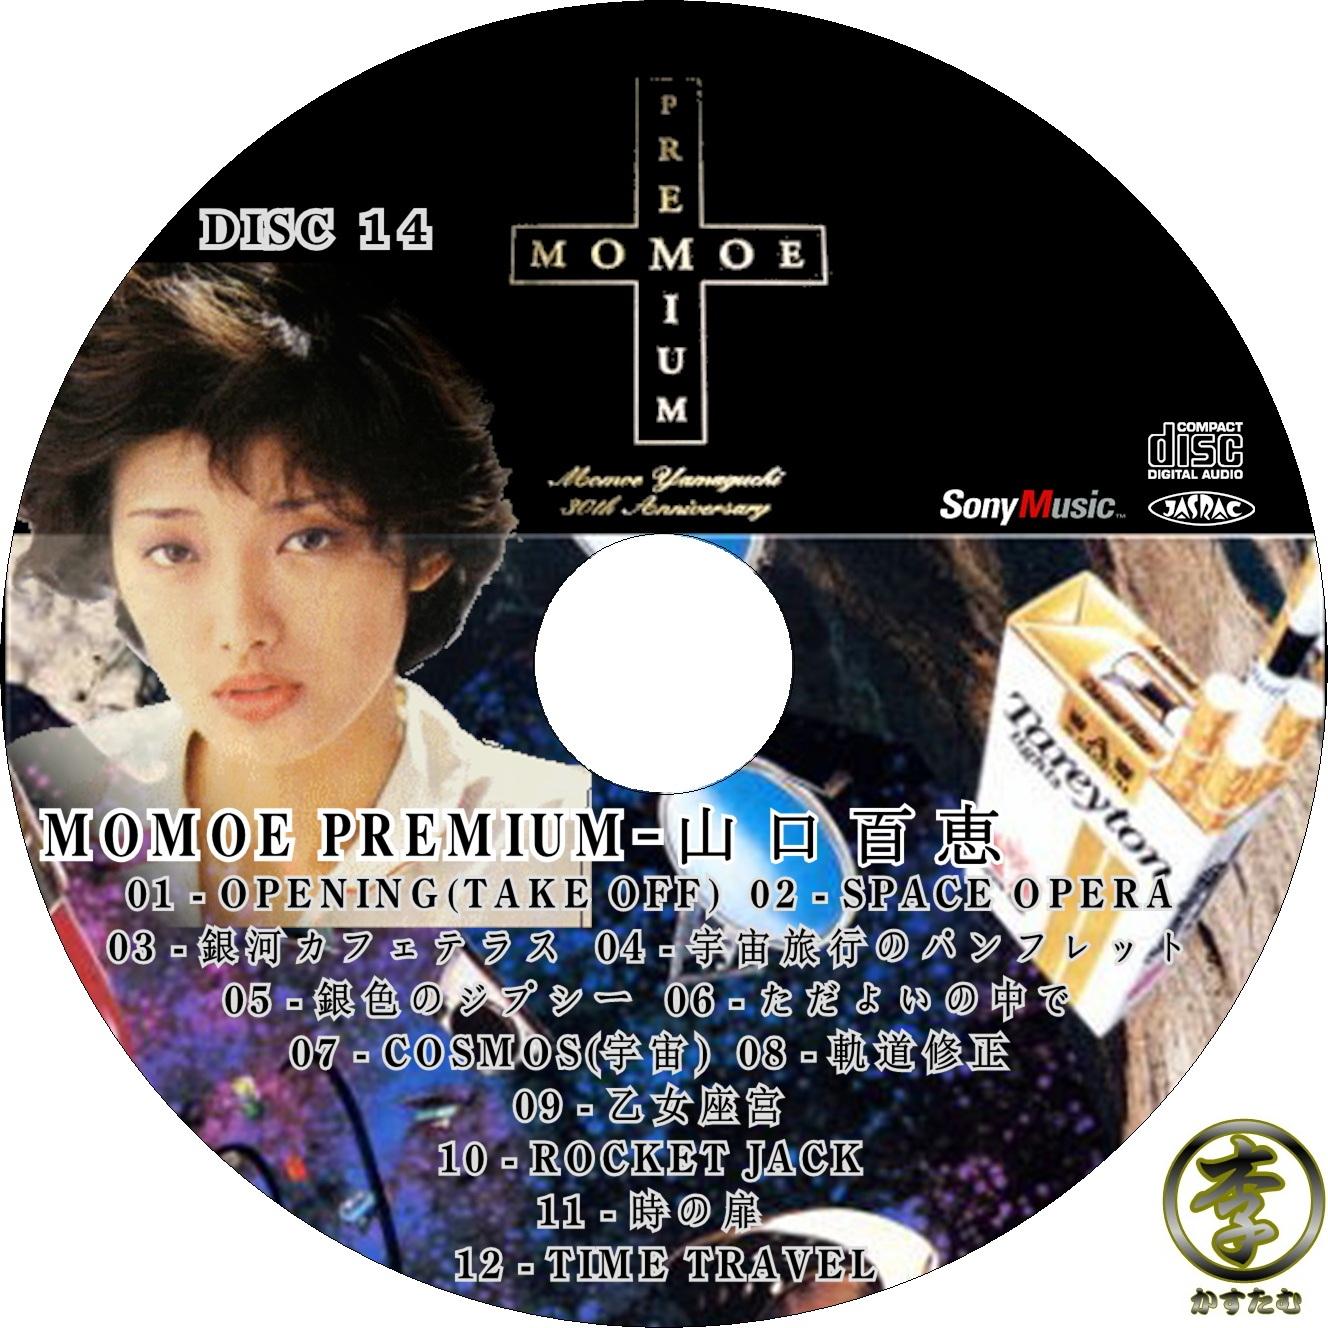 MOMOE PREMIUM DISC14 : クレイ...